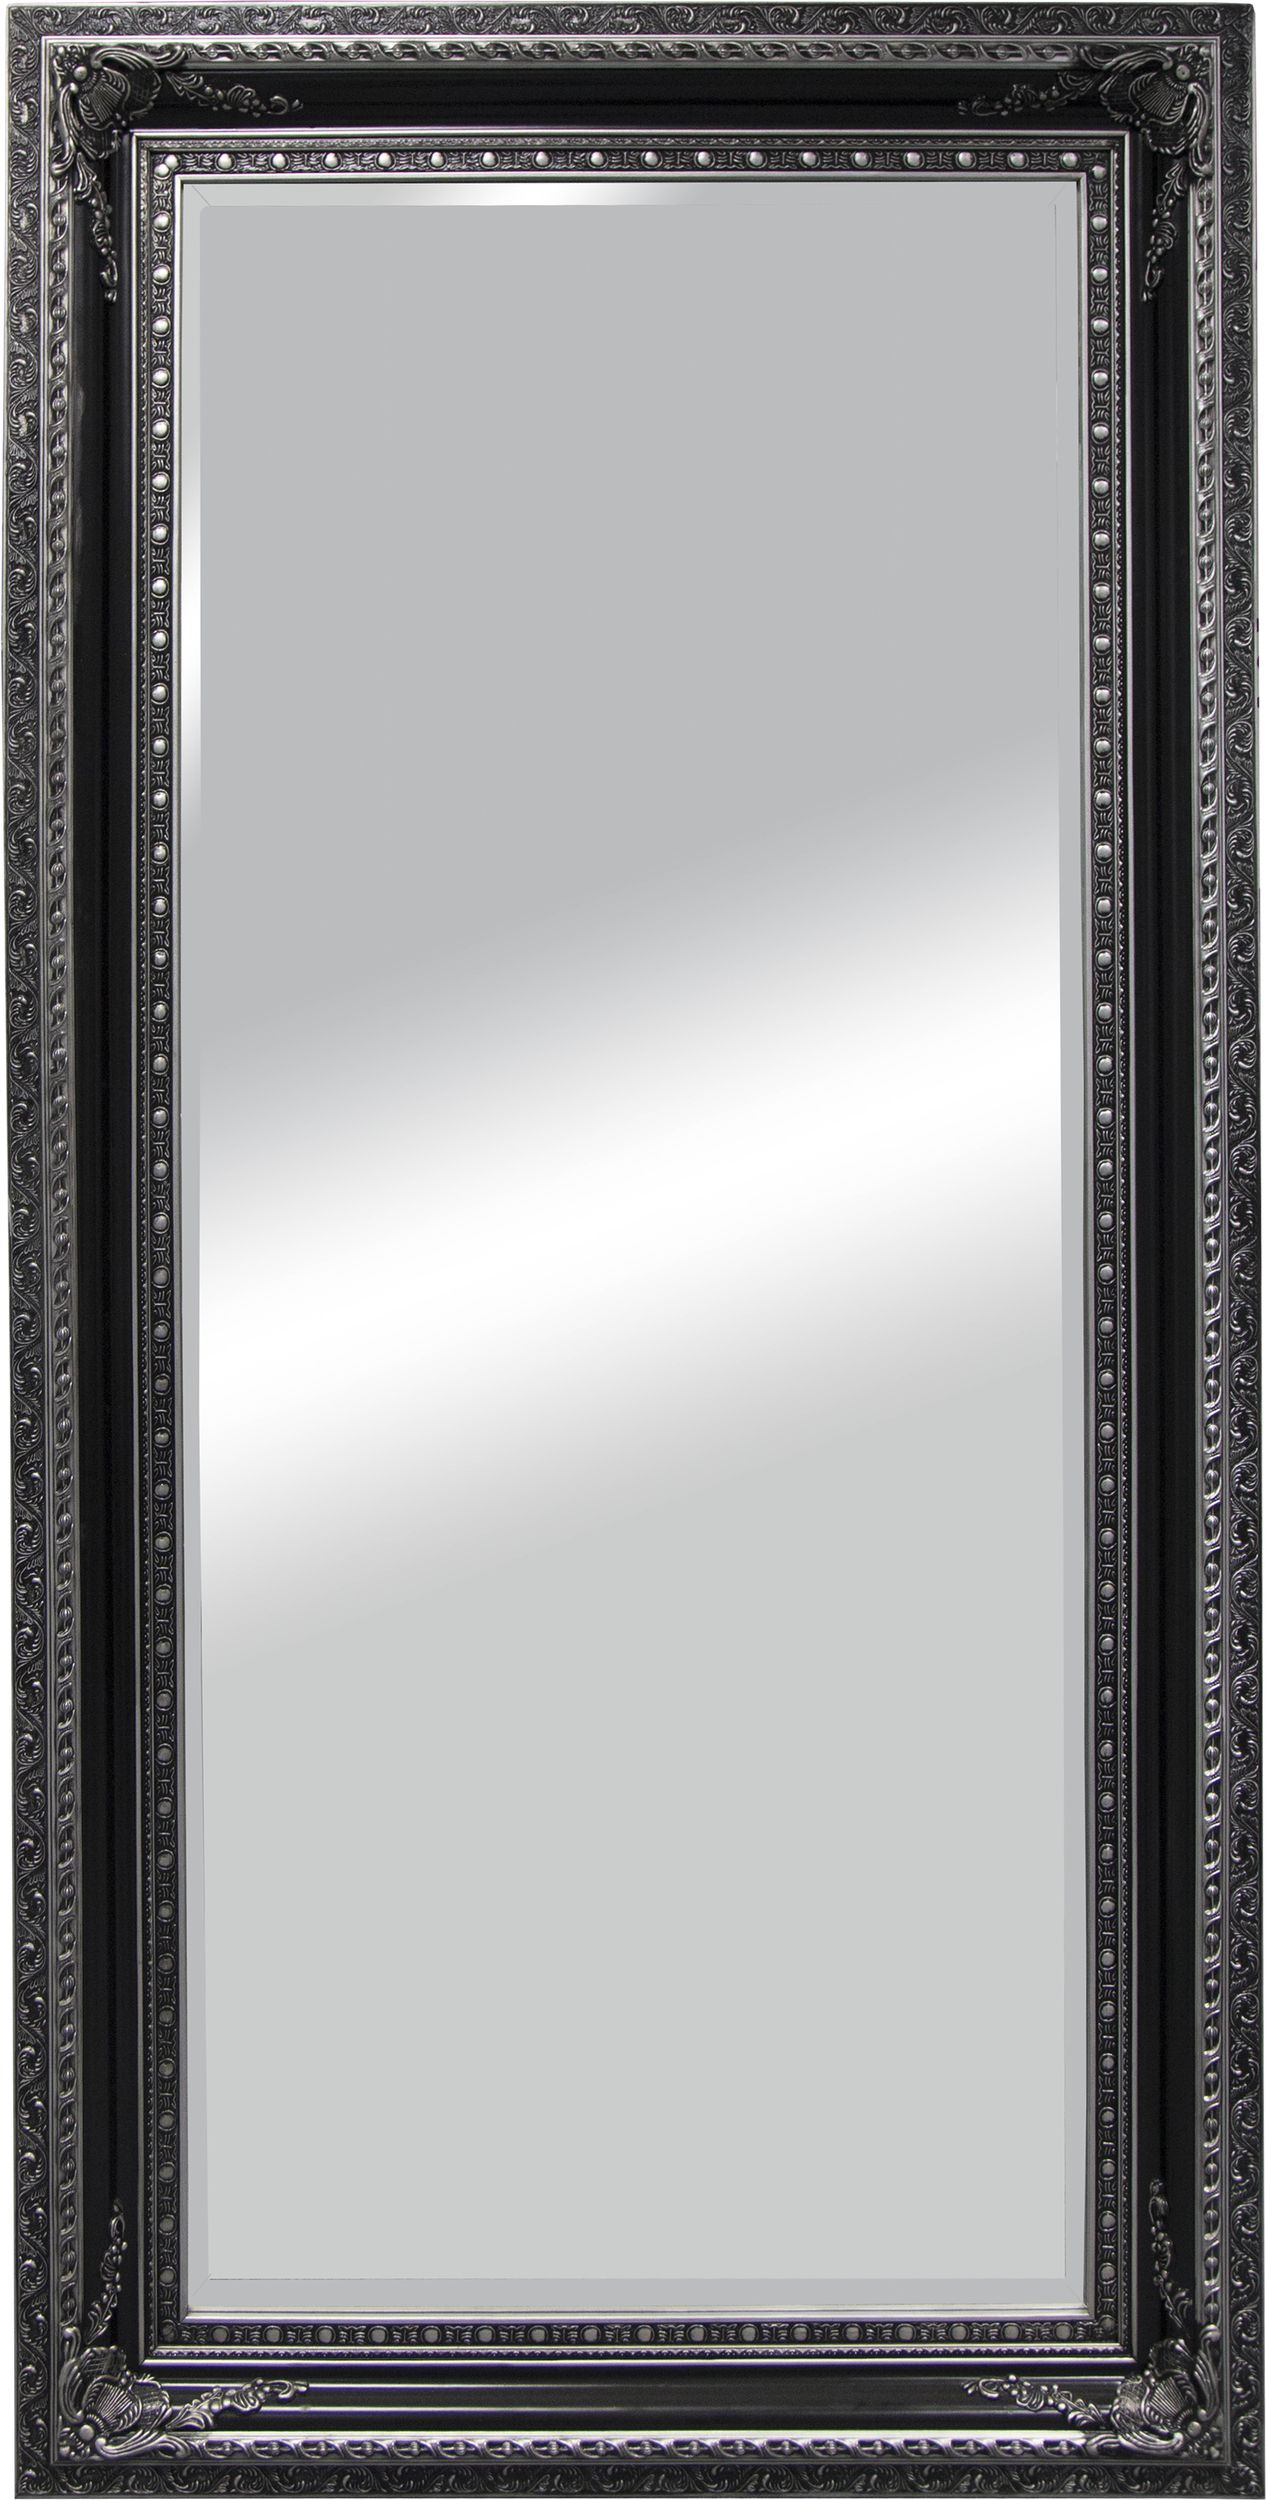 Rahmenspiegel 100x200cm ISA